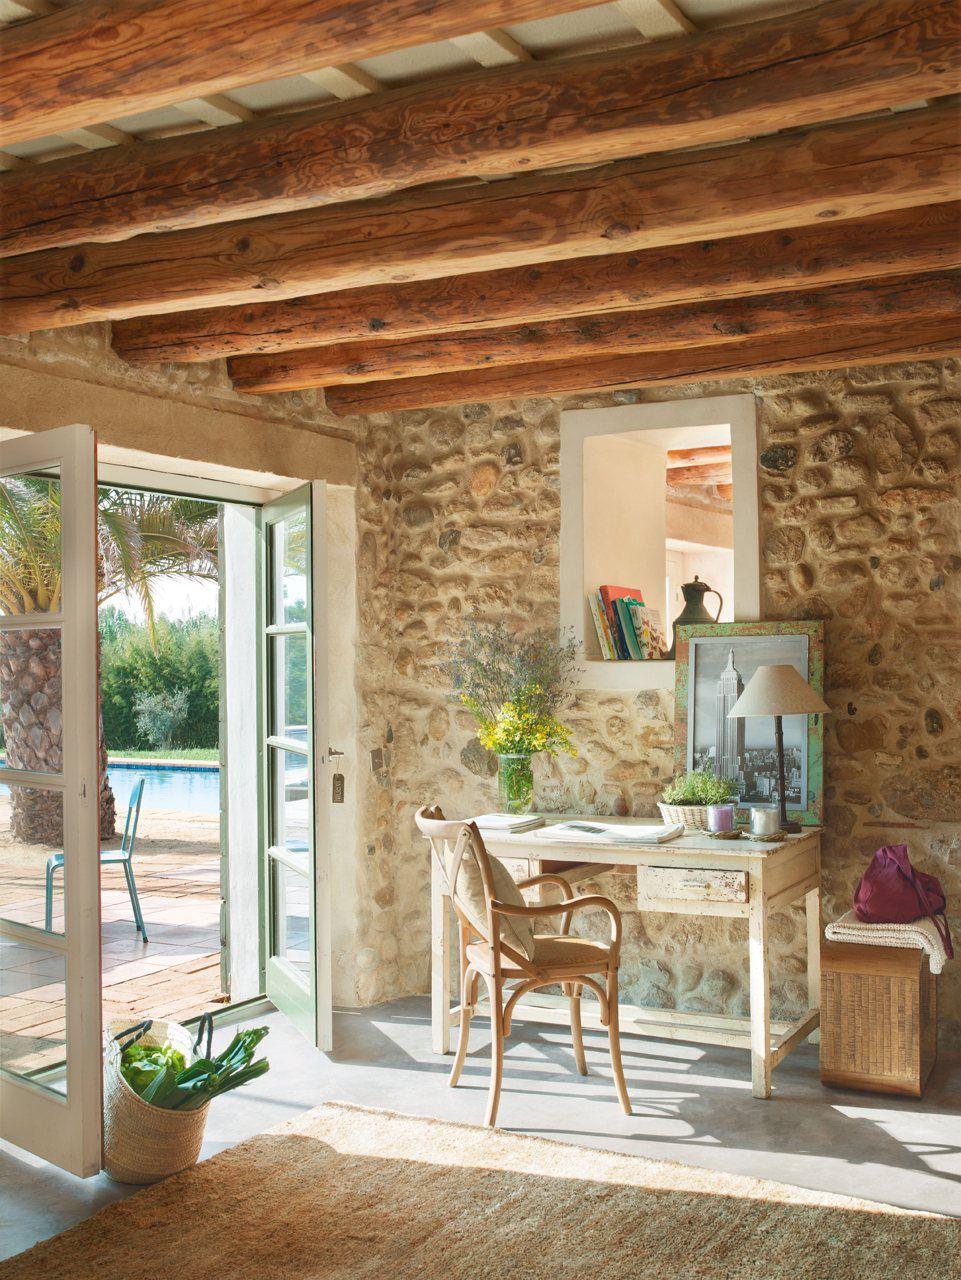 Hall de entrada carpinter a blanca o madera cepillada - Carpinteria casas ...